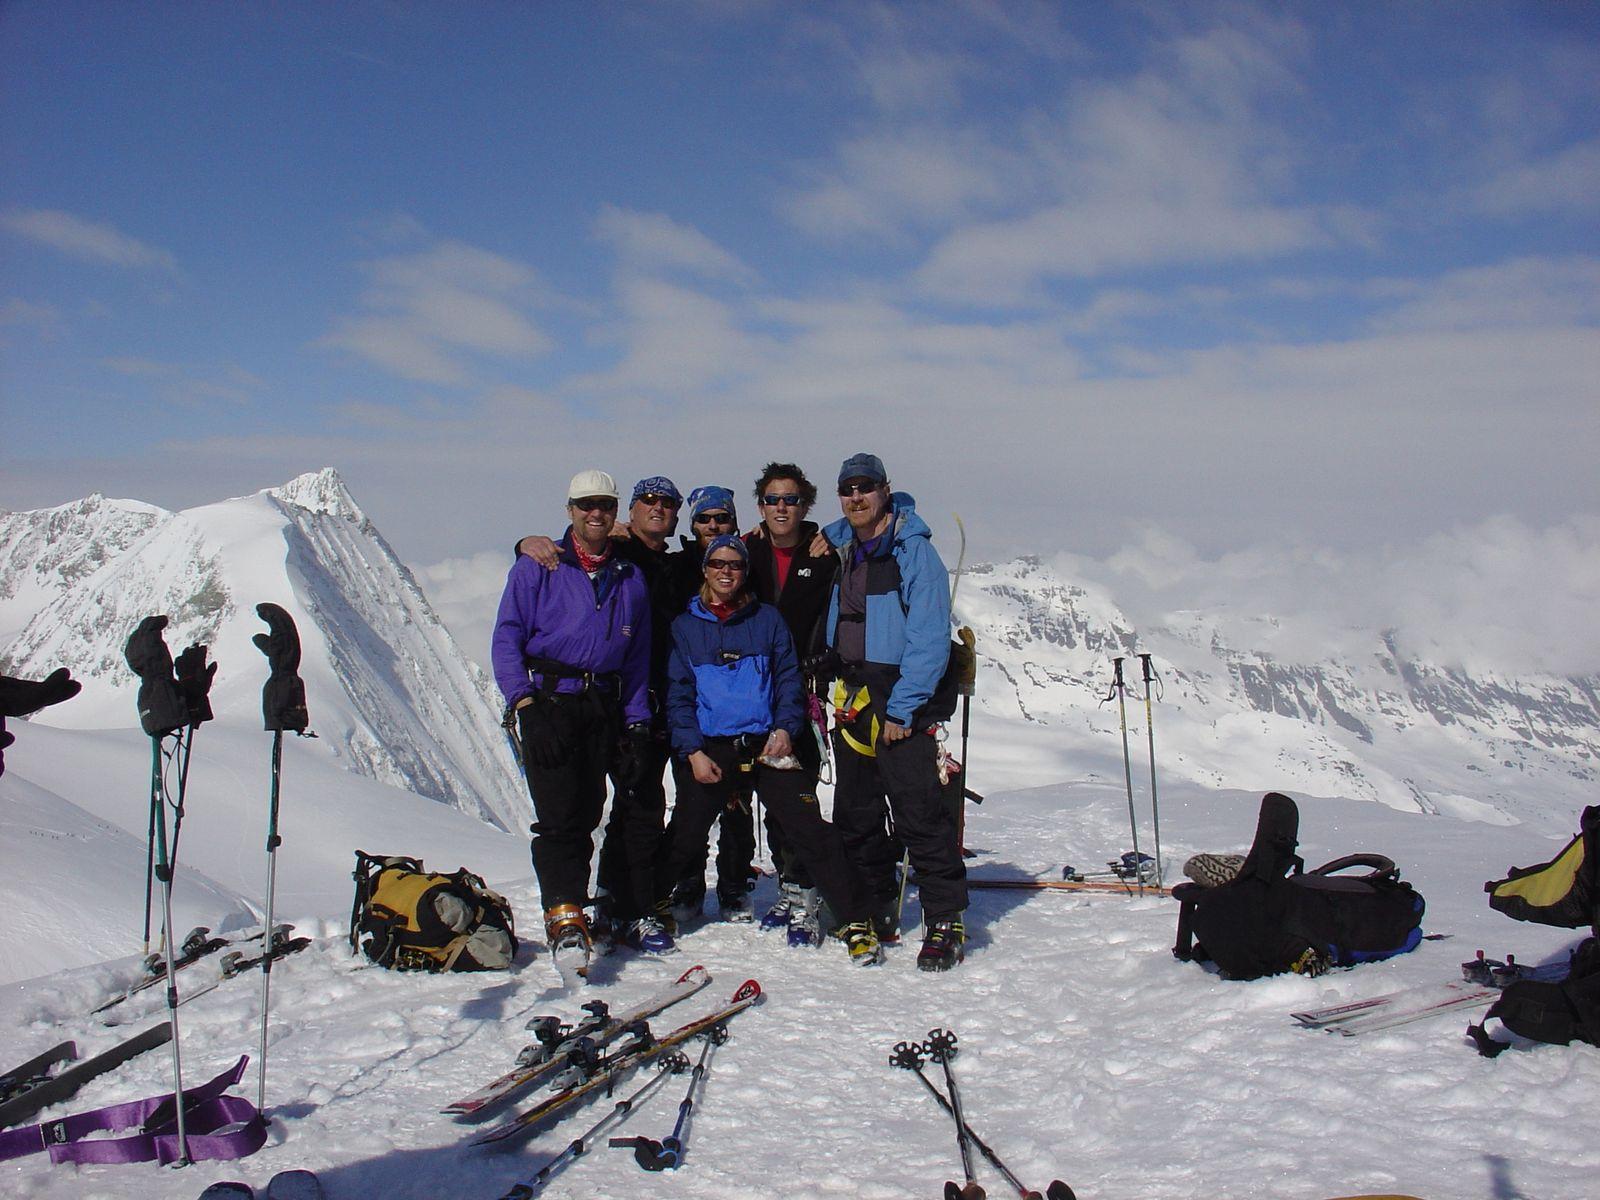 On the summit of the Pigne d'Arolla